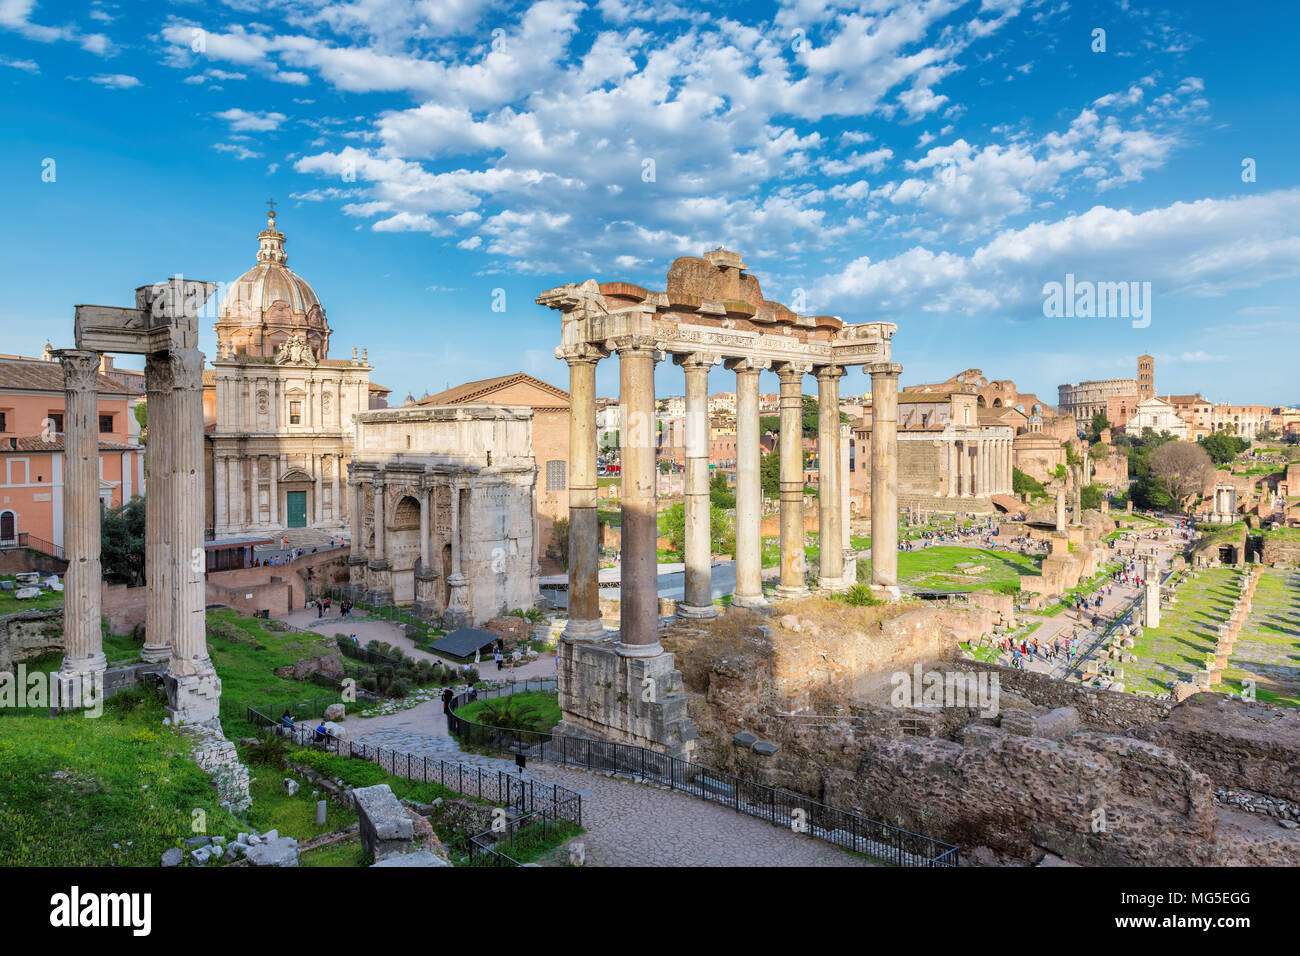 Forum Romanum in Rom, Italien während des Sonnenuntergangs. Stockbild